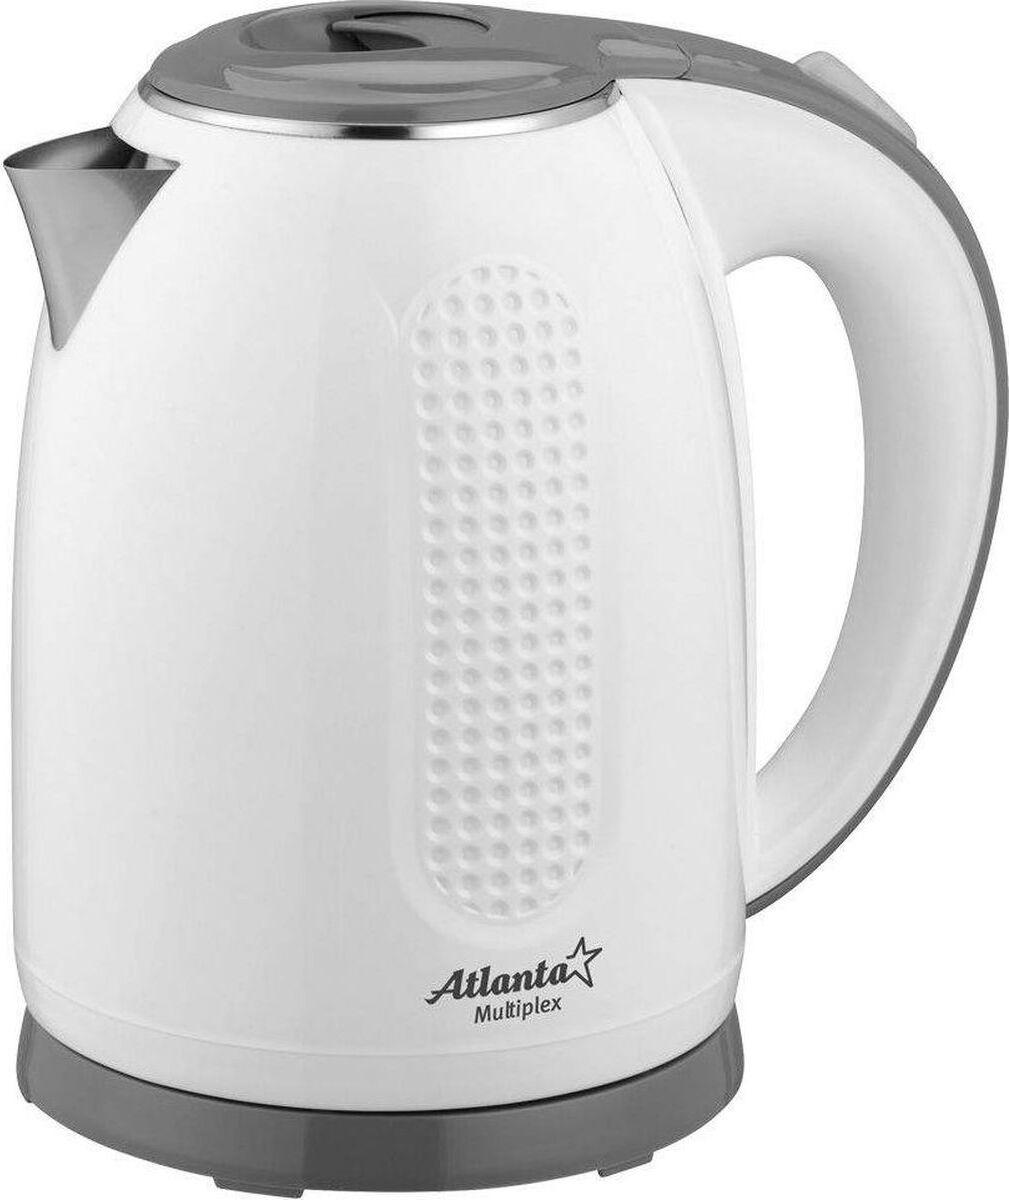 Электрический чайник Atlanta ATH-2427, белый #1